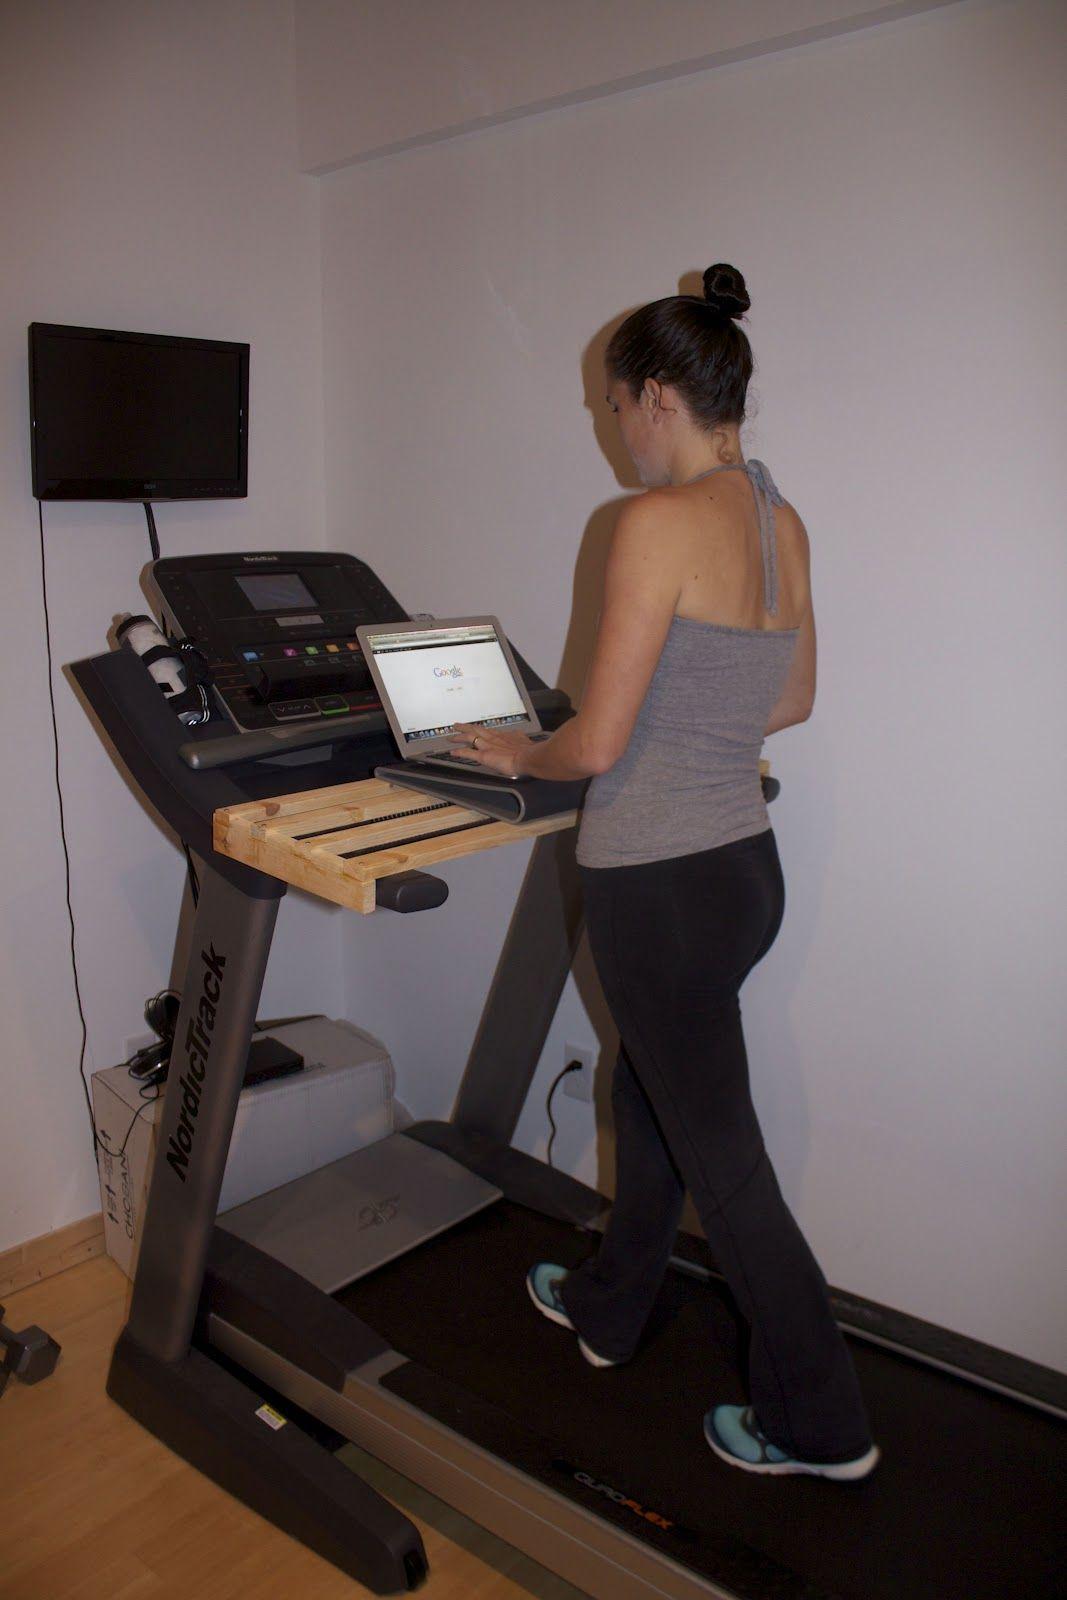 Home Standing Office Design Ideas: Makes Me Want A Treadmill 8) Treadmill Desk